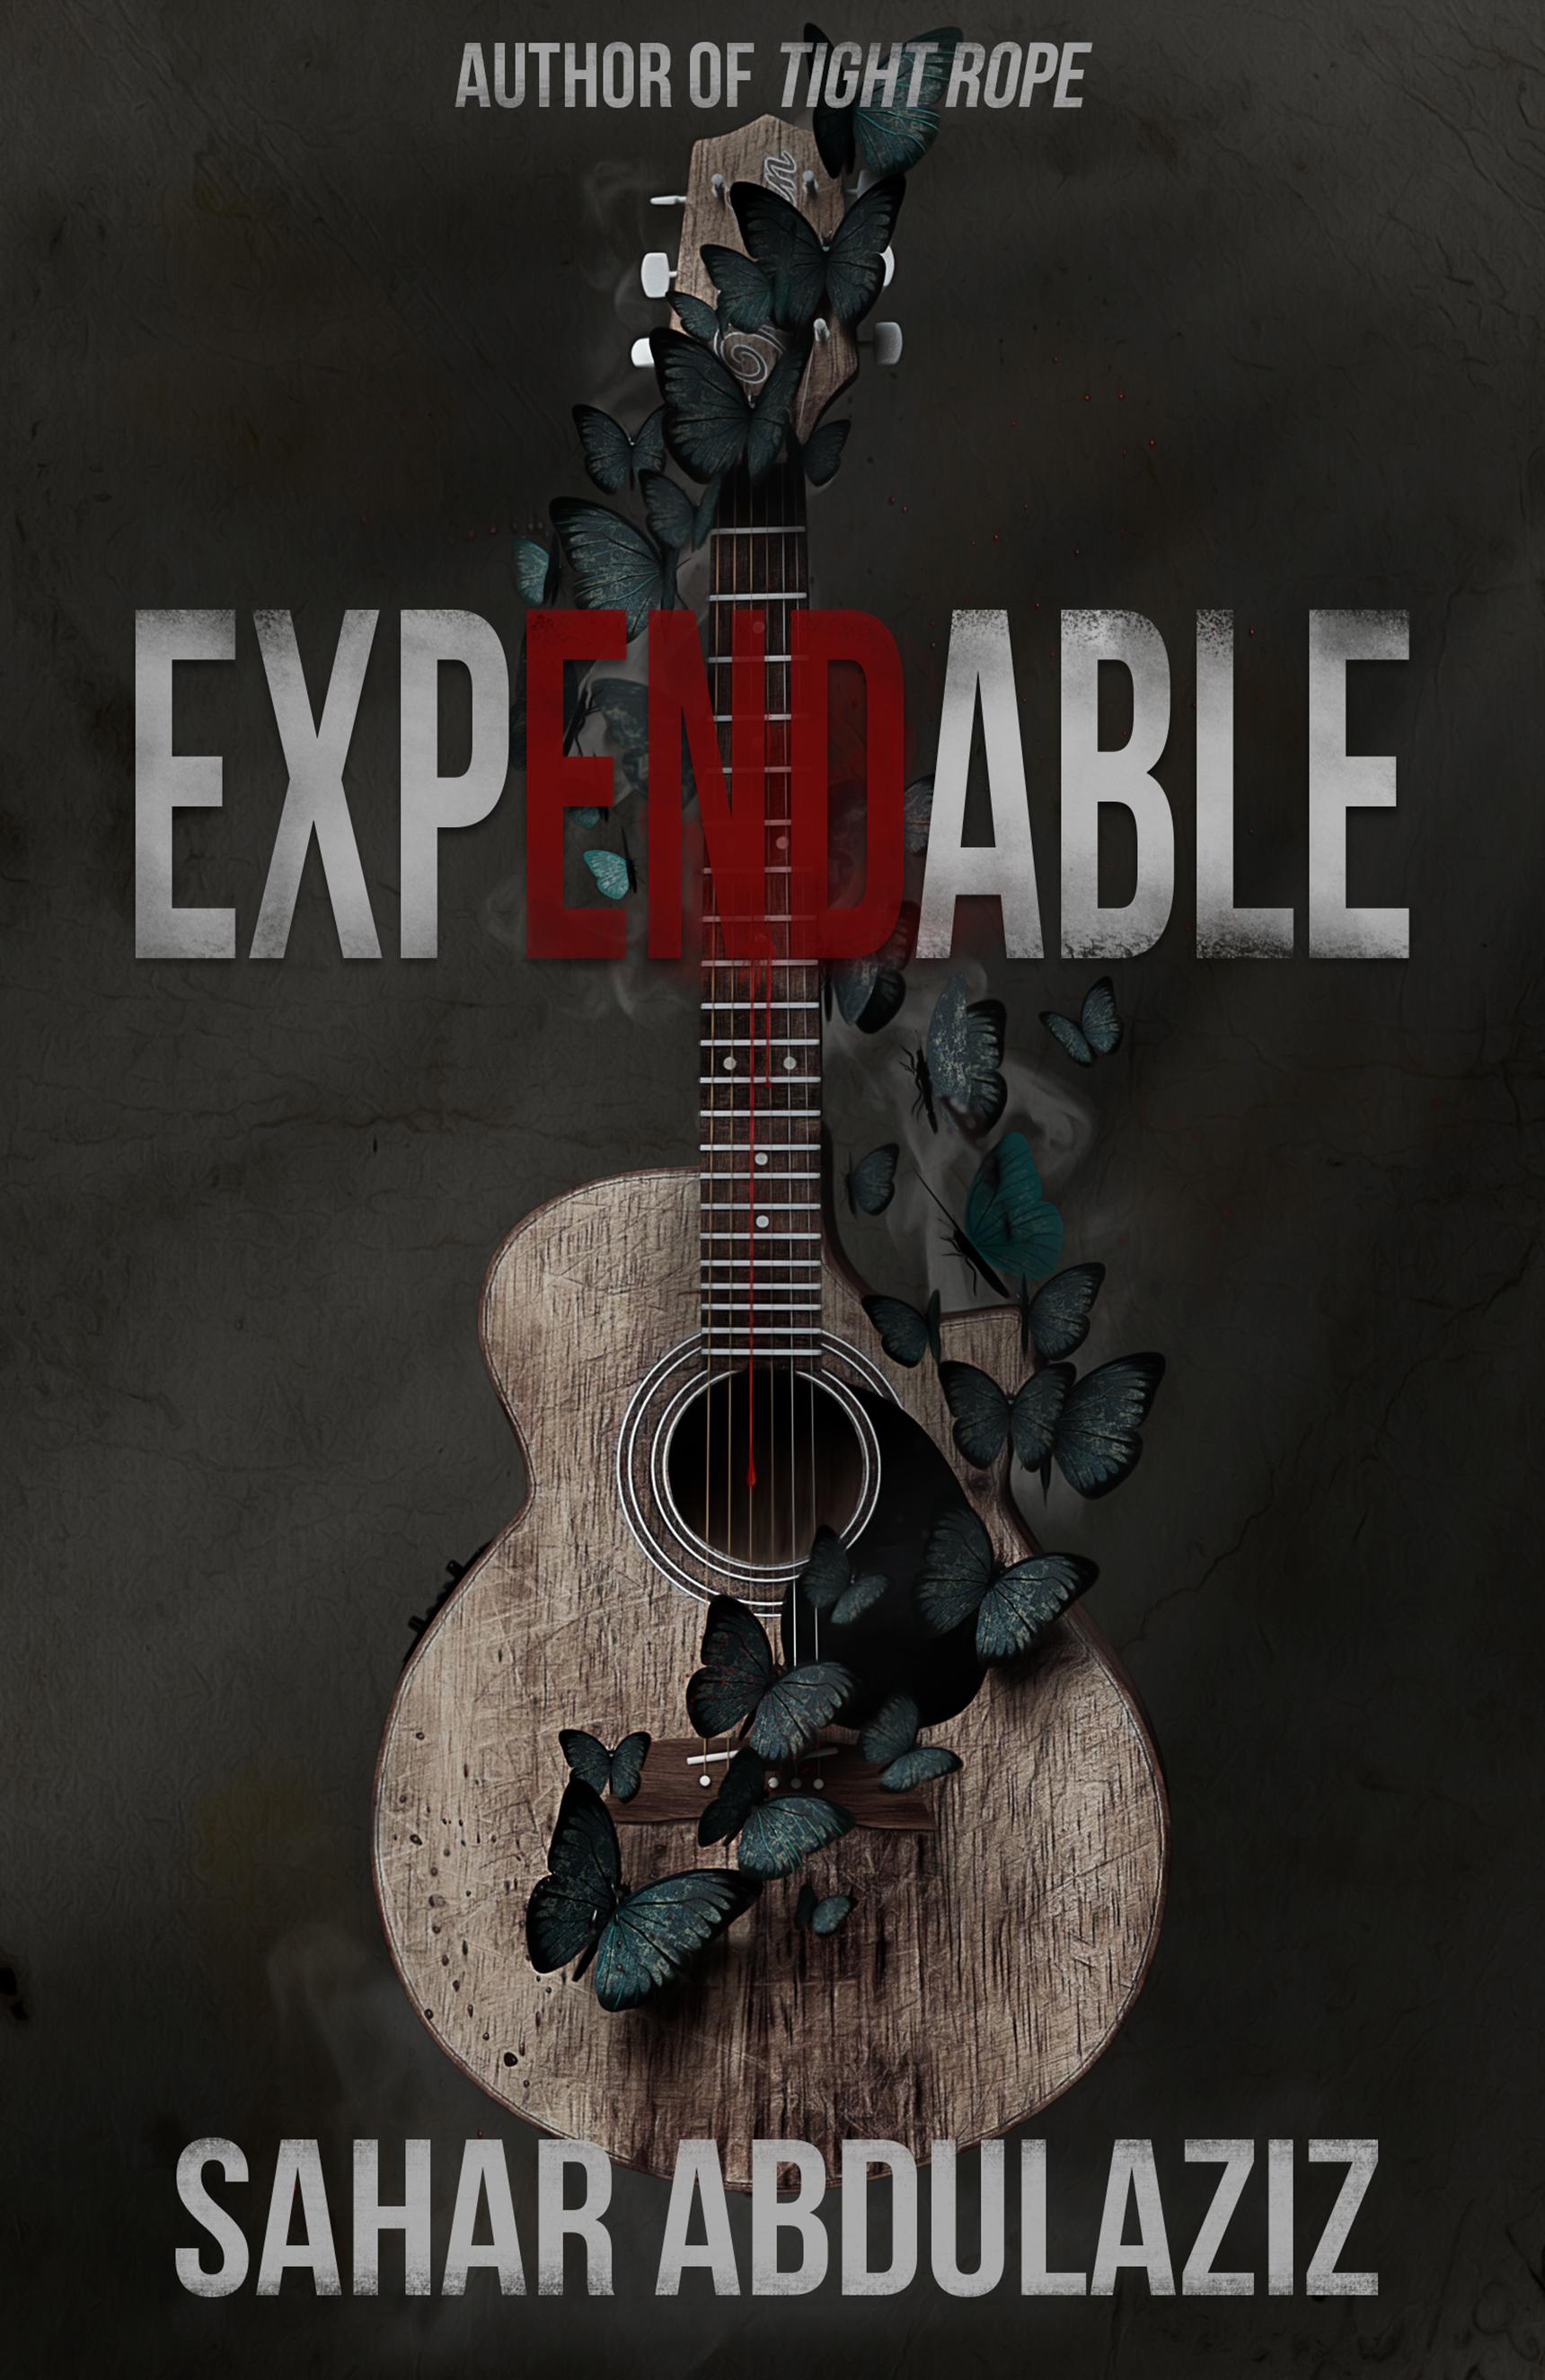 Expendable-ebook.jpg